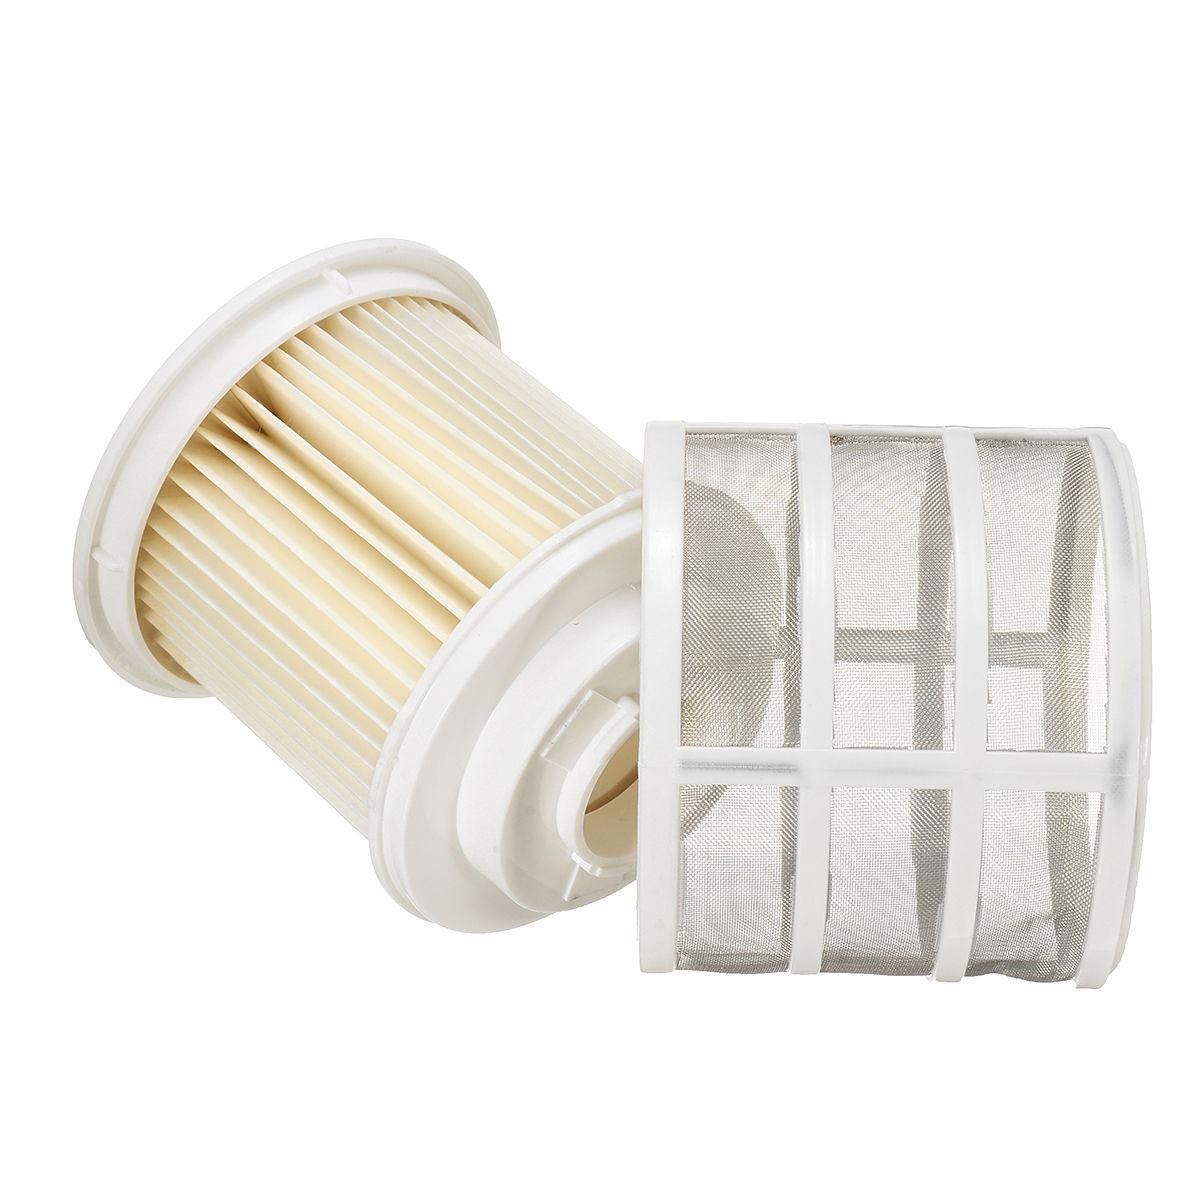 Hepa Filter /& Shroud for Hoover Sprint U57  Vacuum Cleaner Replaces 35601115